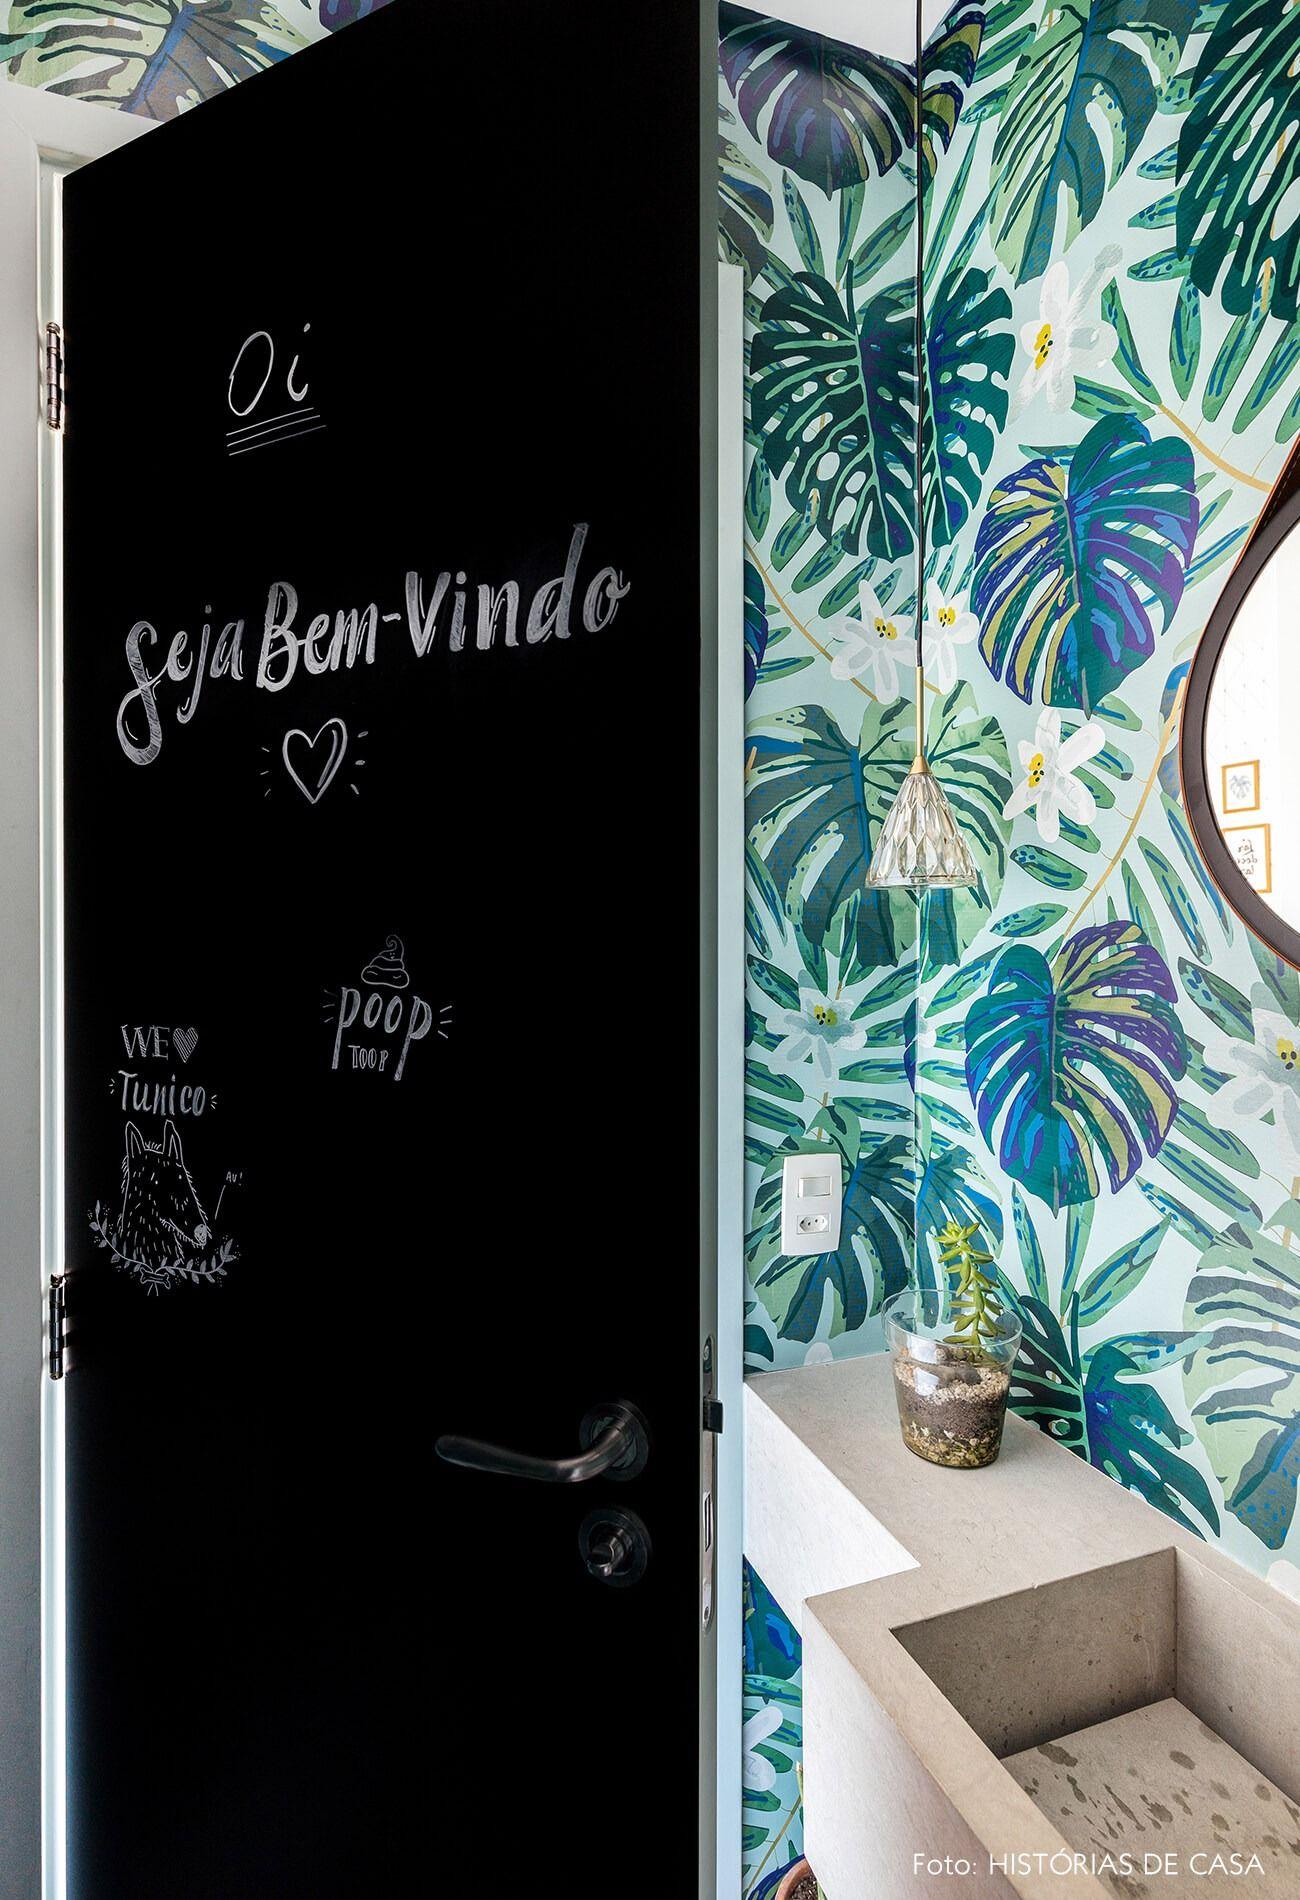 Lavabo com papel de parede de Costela-de-Adão tem adesivo de lousa na porta   Wall stickers give this light apartment full of plants even more color and textures. Get inspired too!